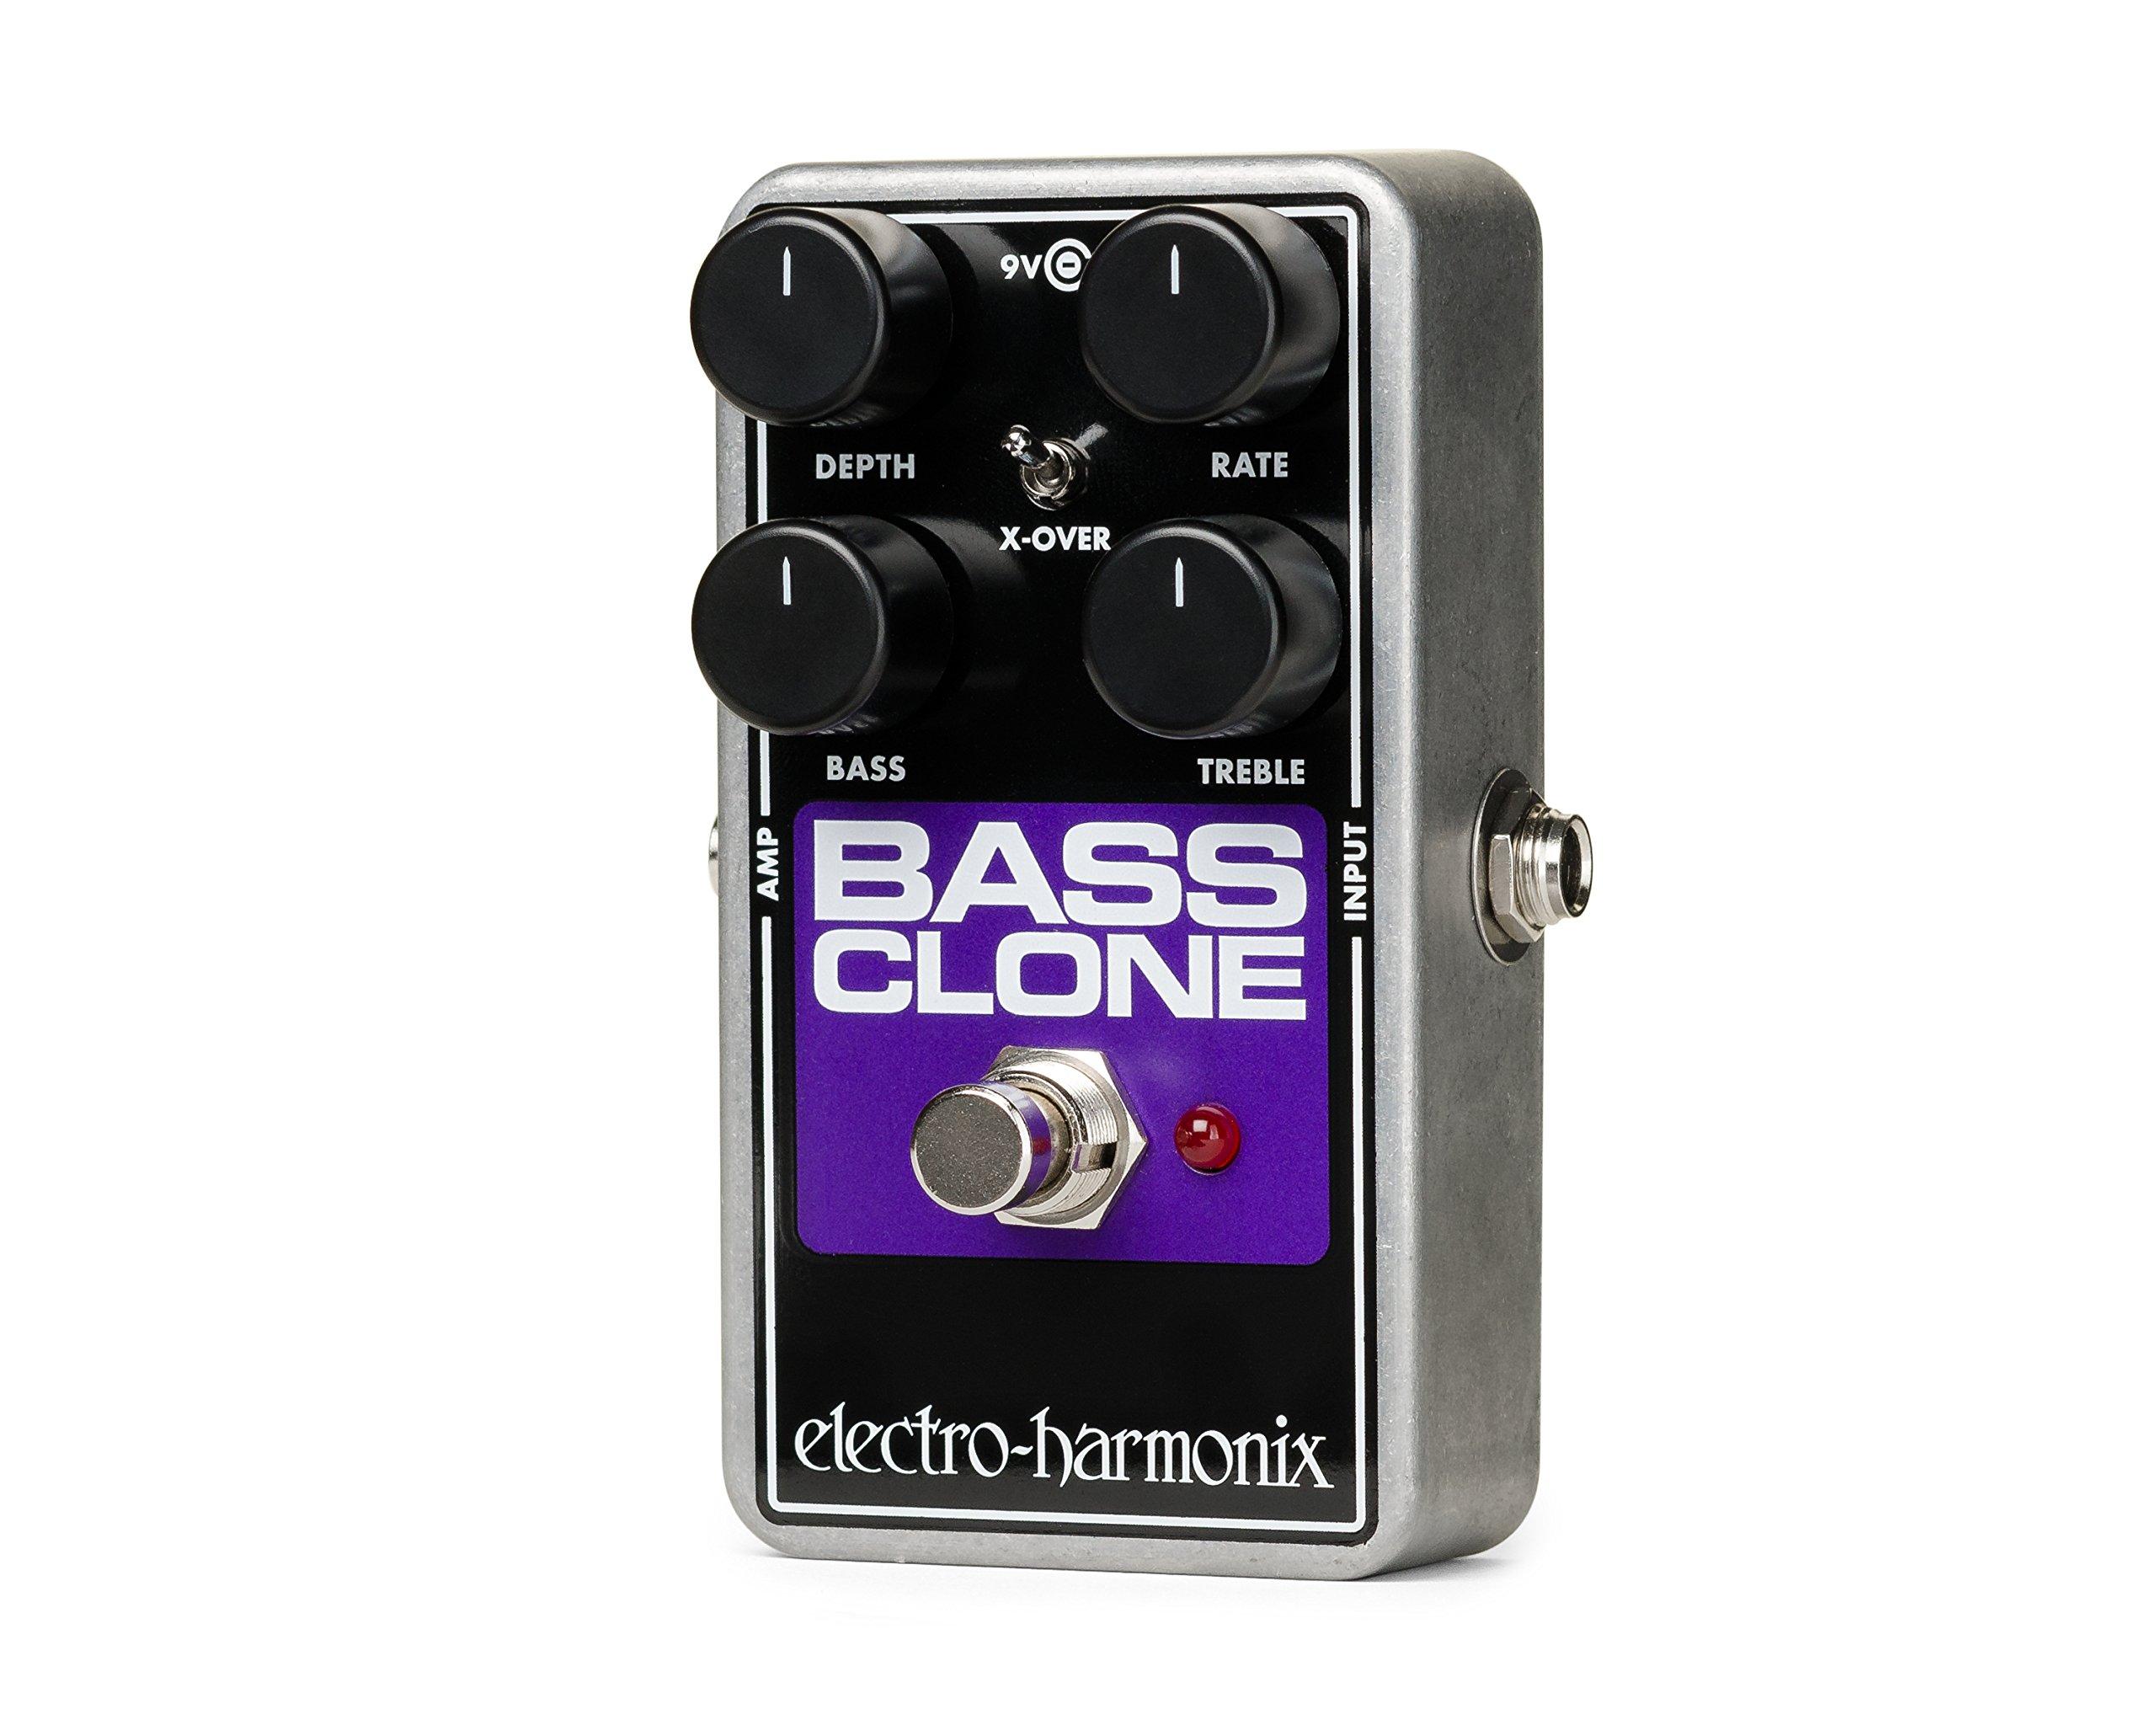 Electro-Harmonix BASS CLONE Bass Chorus Effect Pedal by Electro-Harmonix